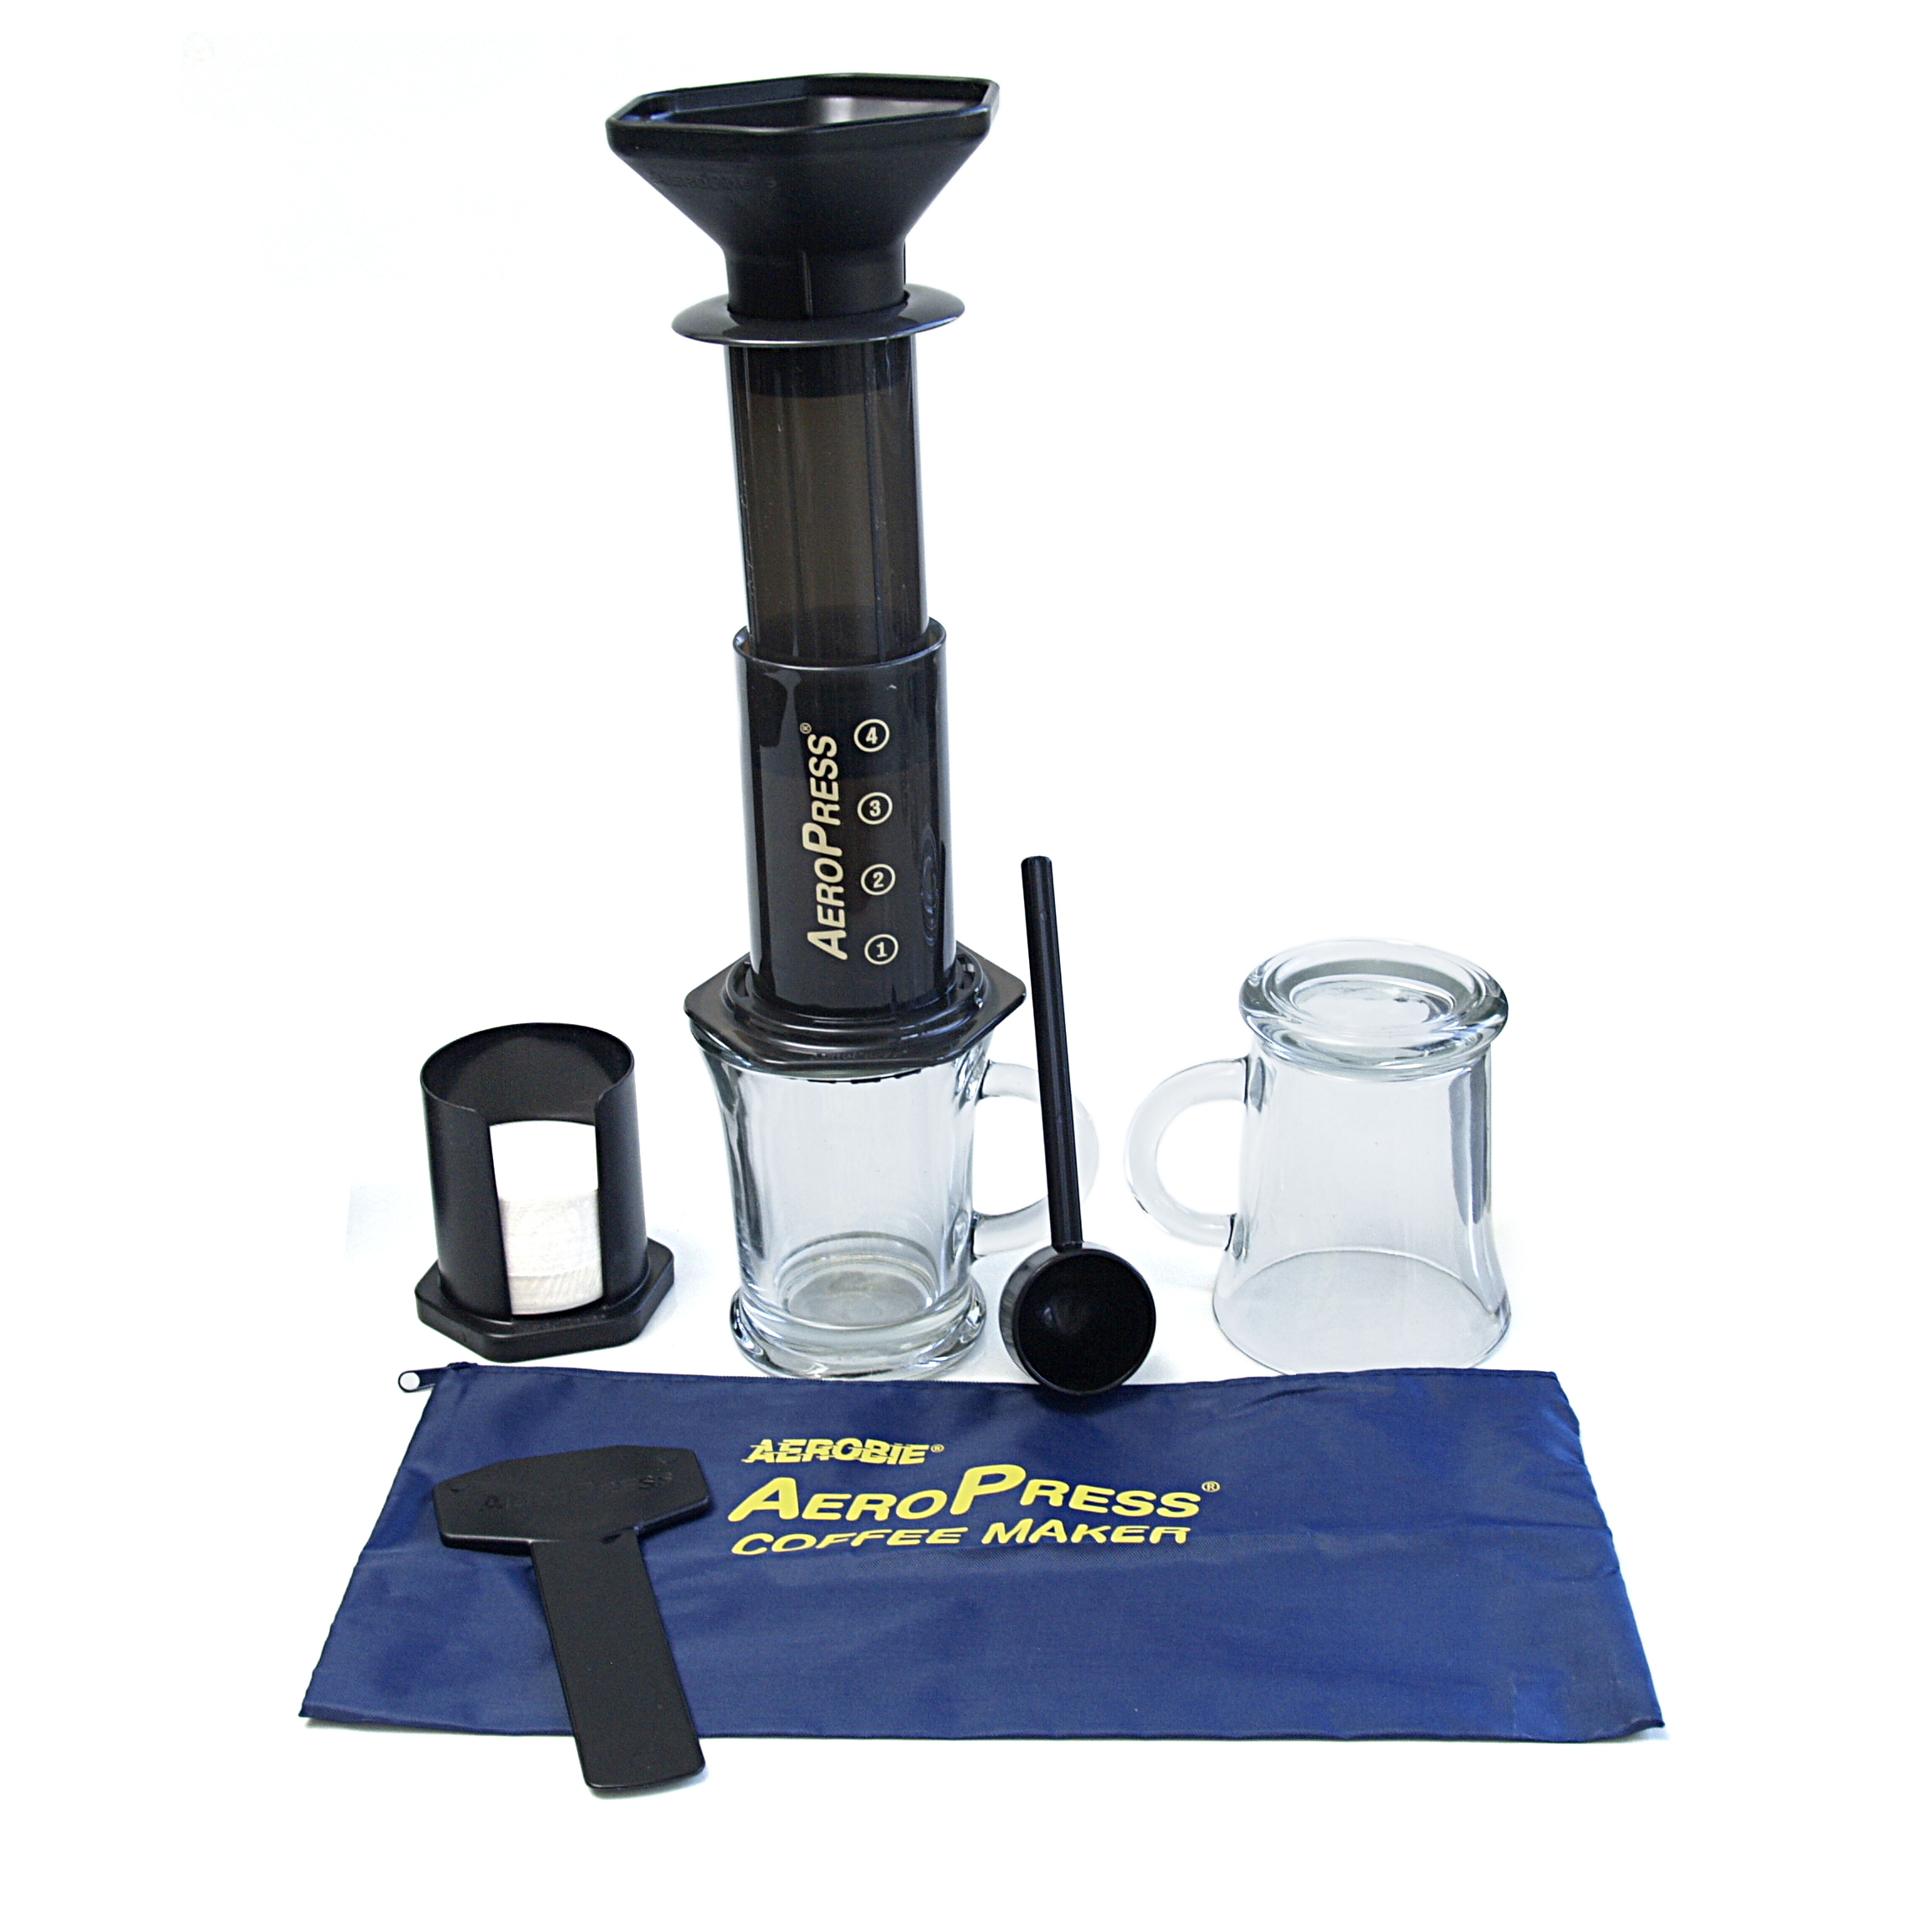 Aerobie AeroPress Coffee Maker with Tote Bag and 2 Cafe Mocha Mugs